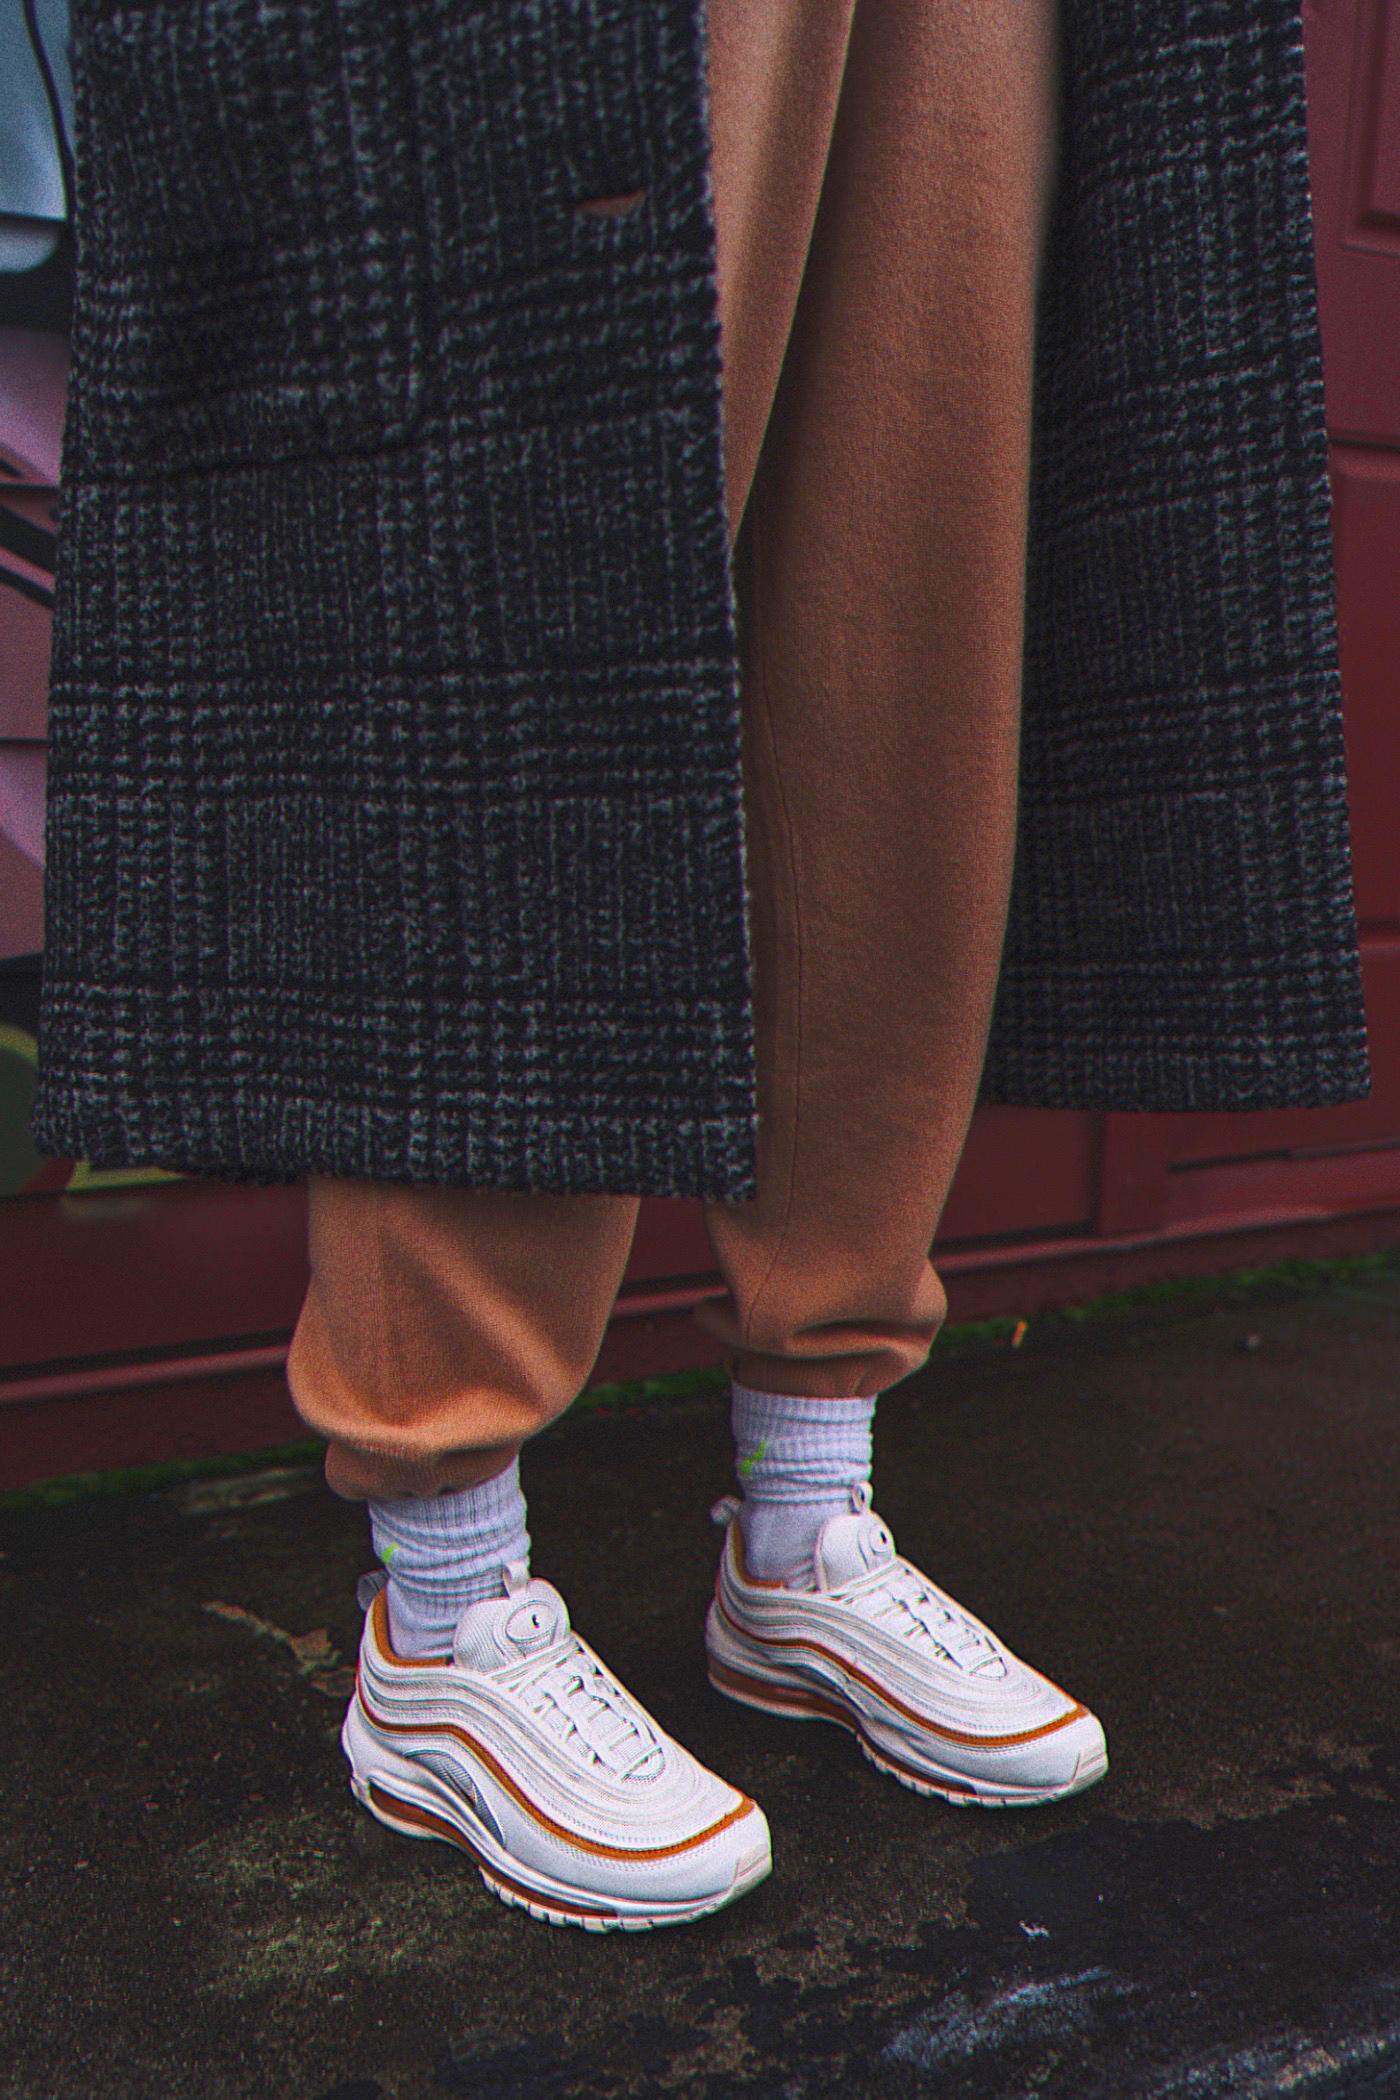 Custom Nike Air Max 97